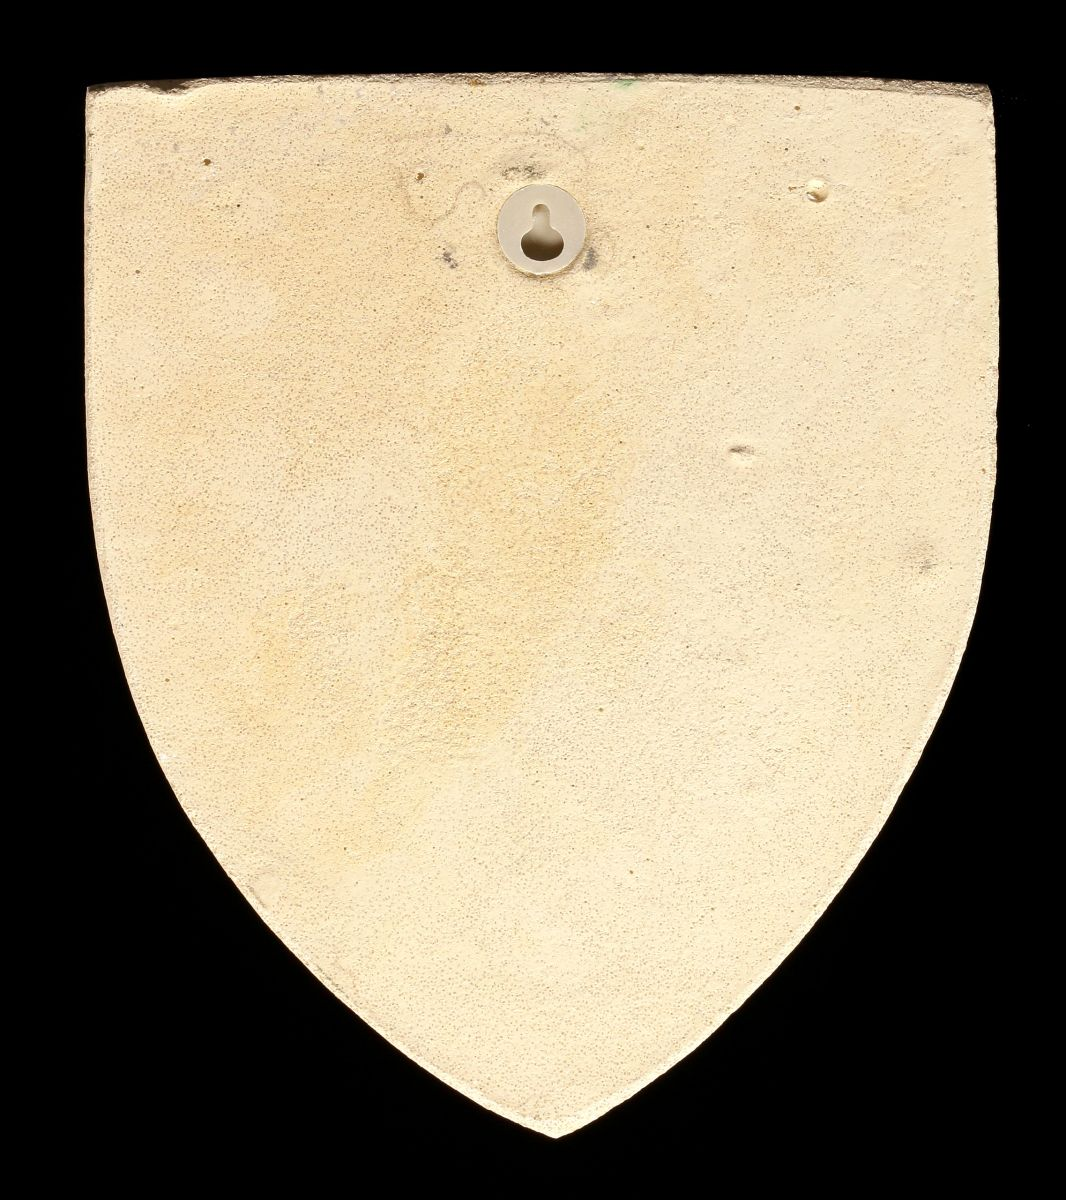 Ritter Wappen Wandrelief Triskele Fantasy Mittelalter Wanddeko